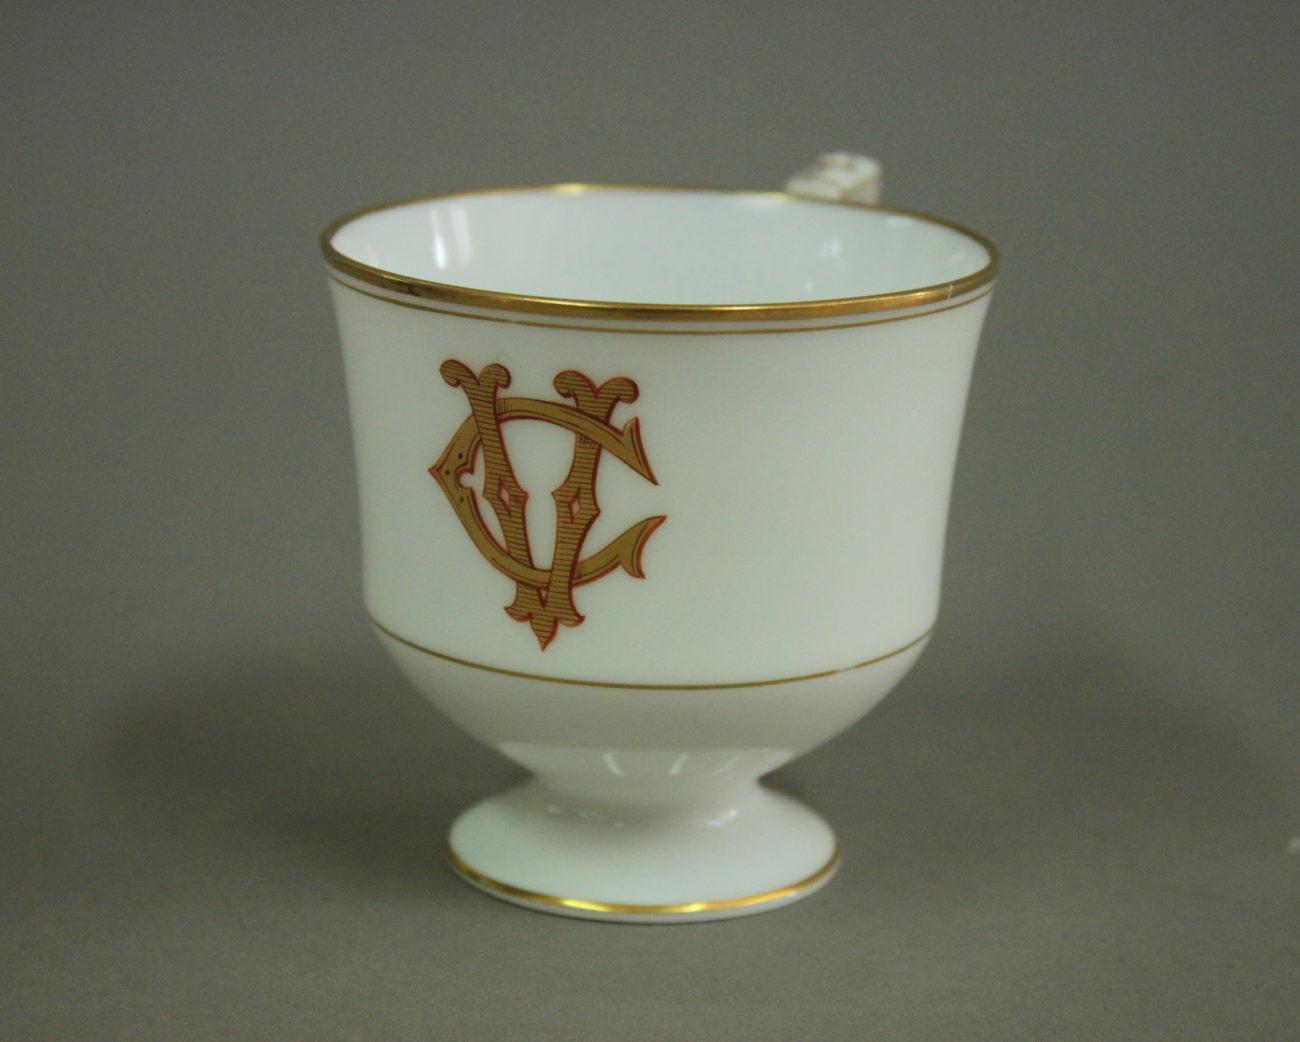 Restauration d'une tasse en porcelaine dorée